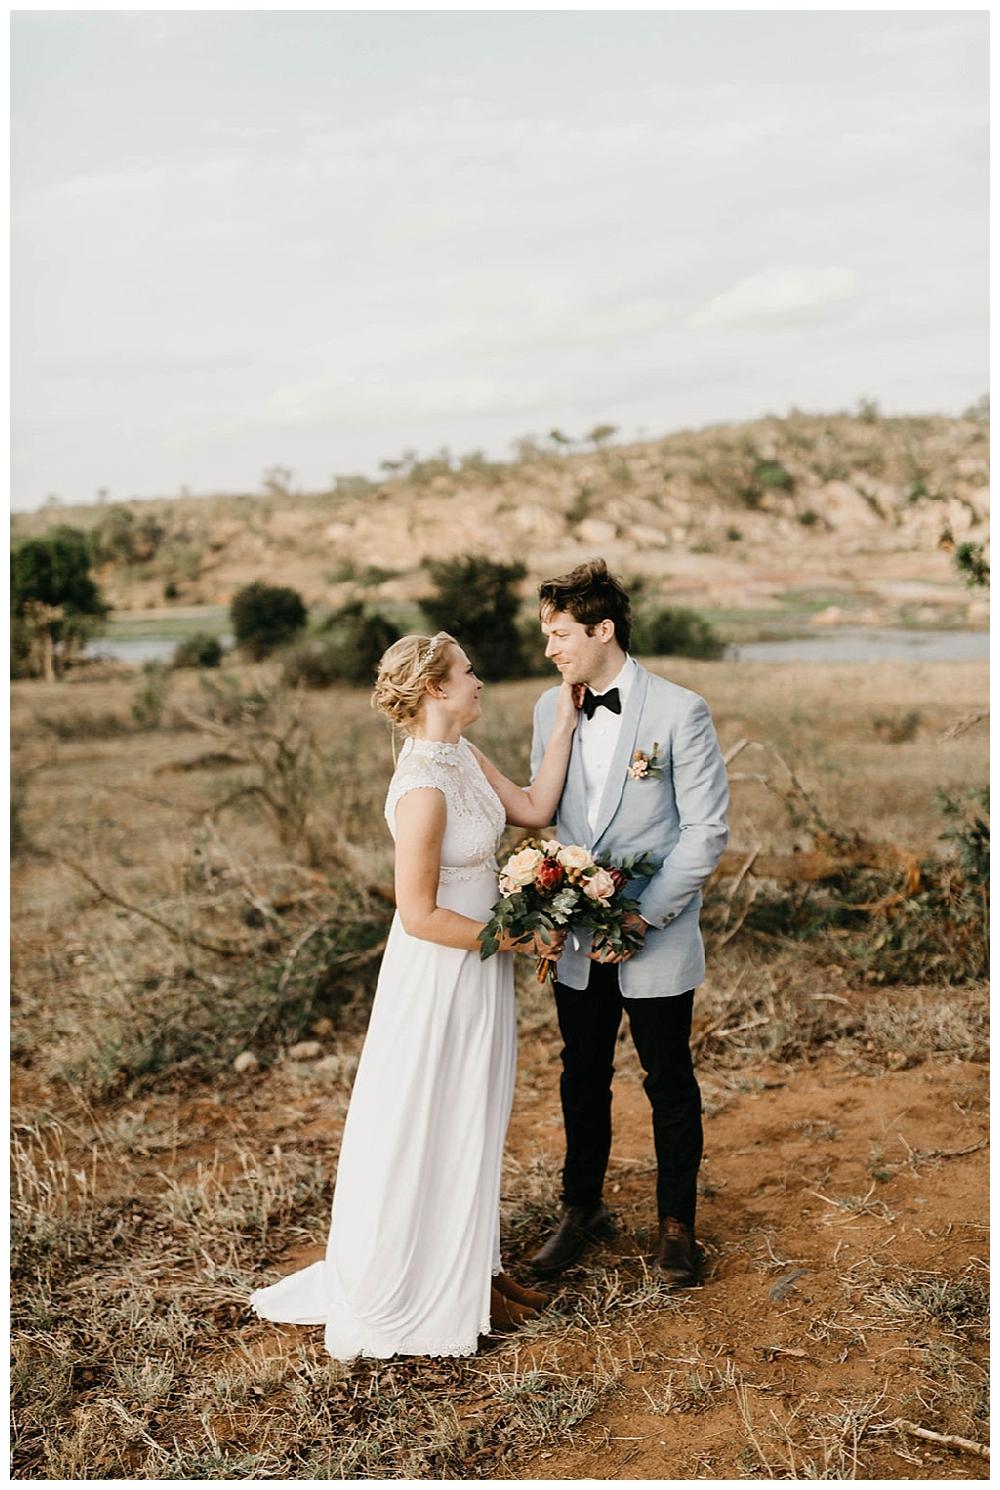 christinakarstphotography_southafricaelopement-346.jpg